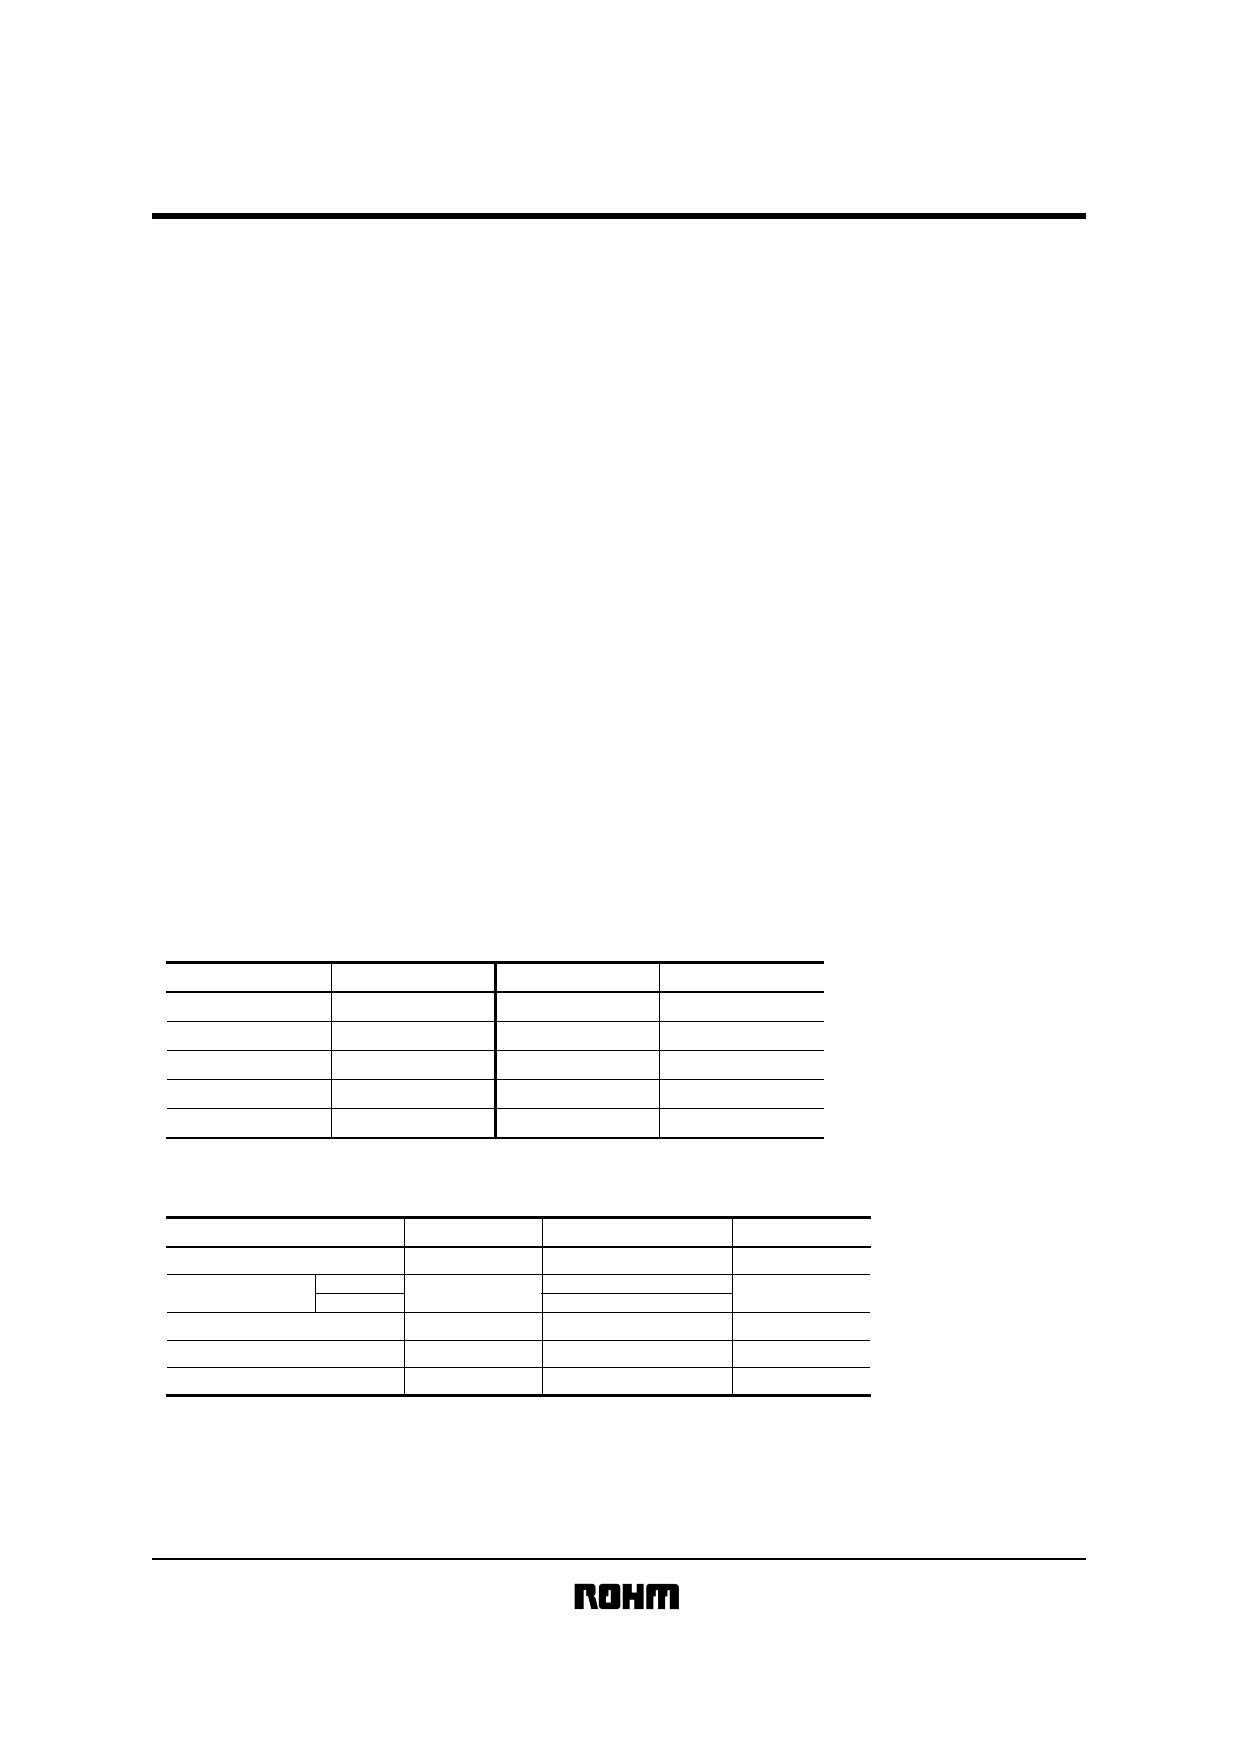 BA00Sxx datasheet